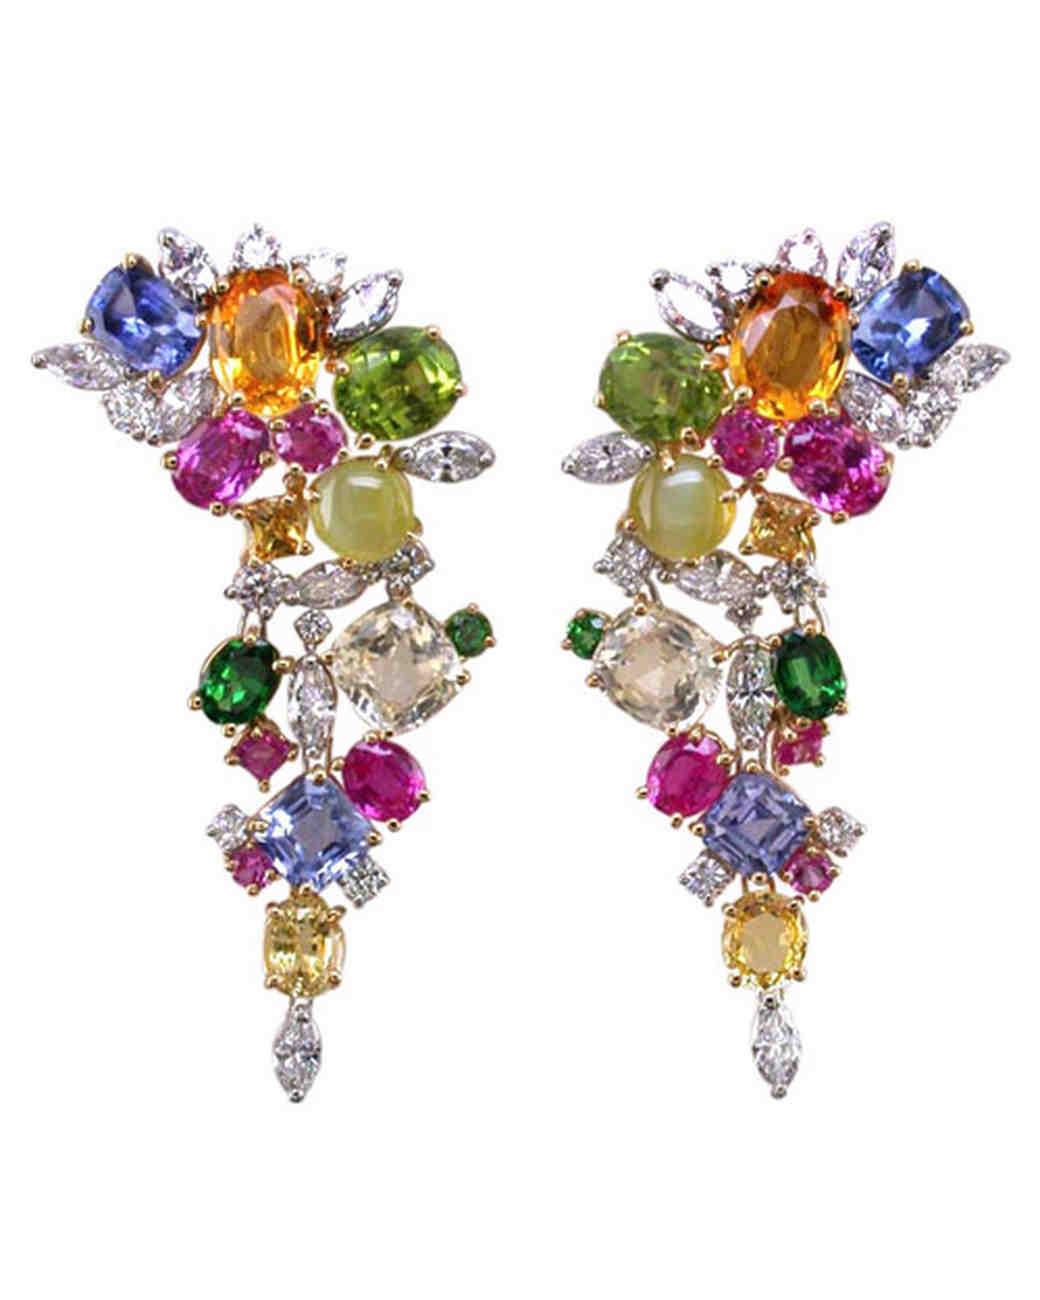 heyman_ohb_705849_gold_plat_multi_col_sap_earrings.jpg